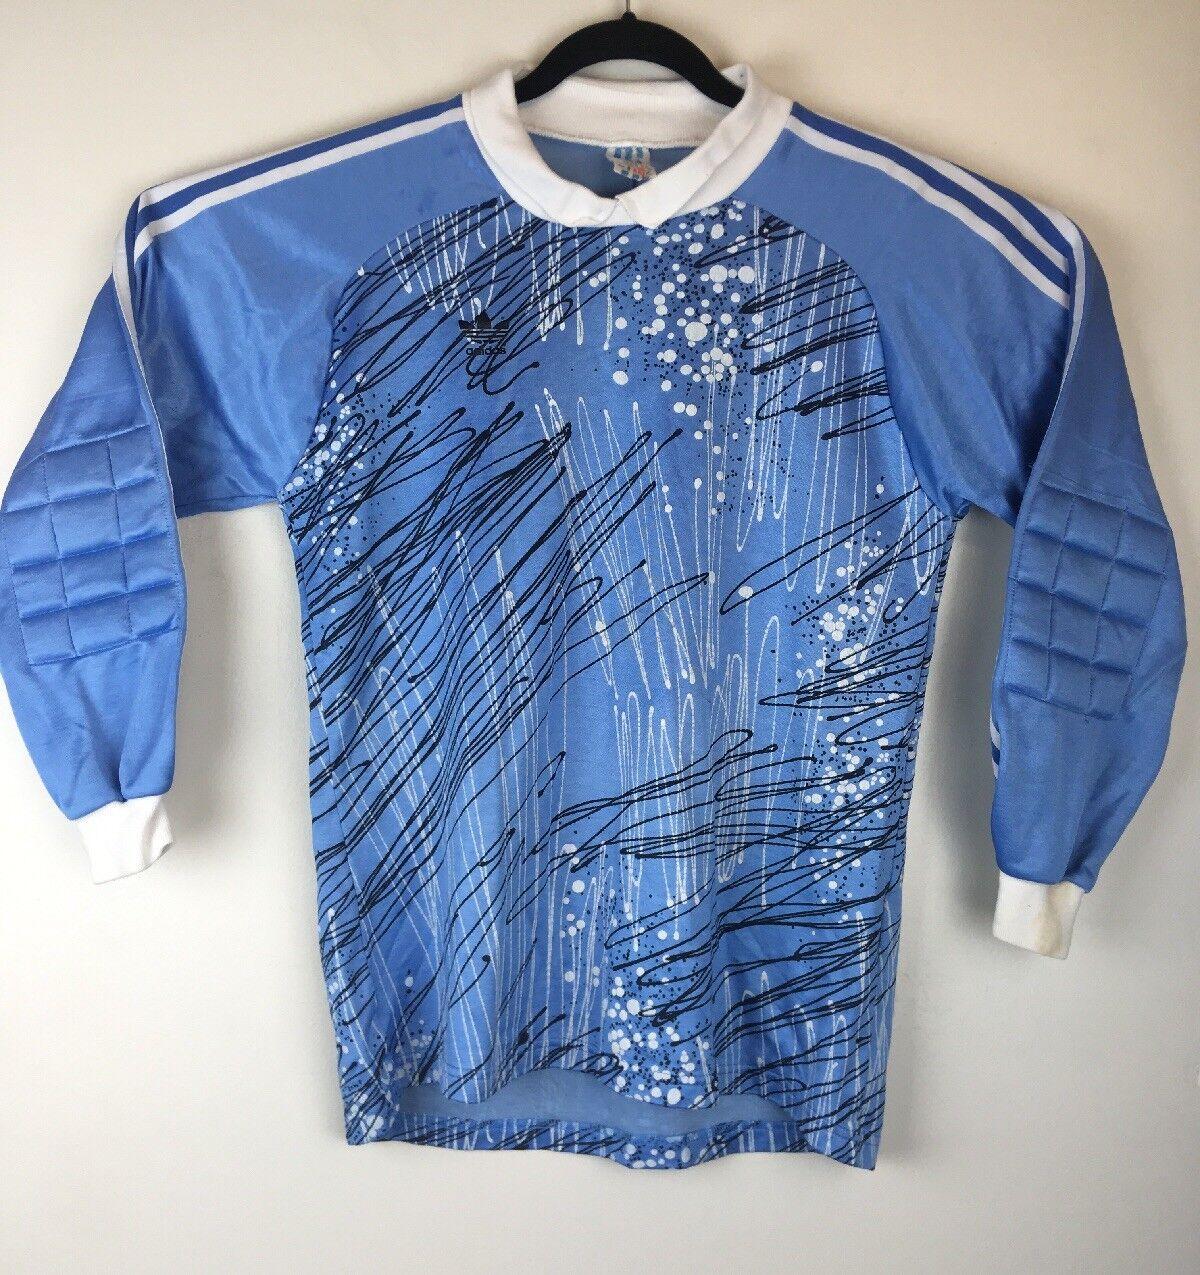 03dafa588 Vintage Adidas Goalkeeper Jersey Goalie silverina Padded bluee White Size M  J5